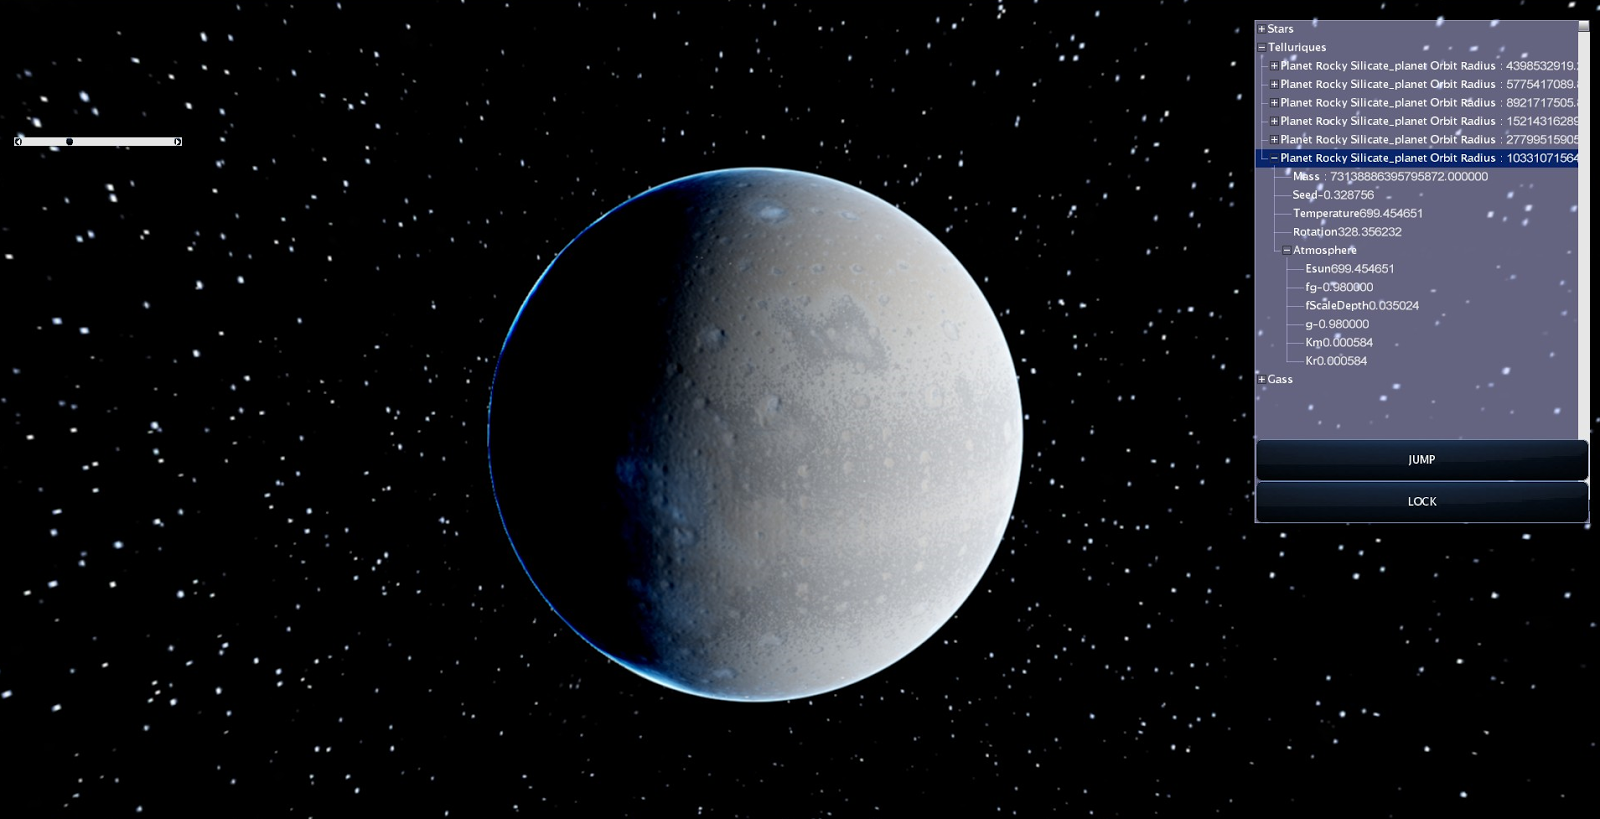 My go at a procedural planet generator : proceduralgeneration